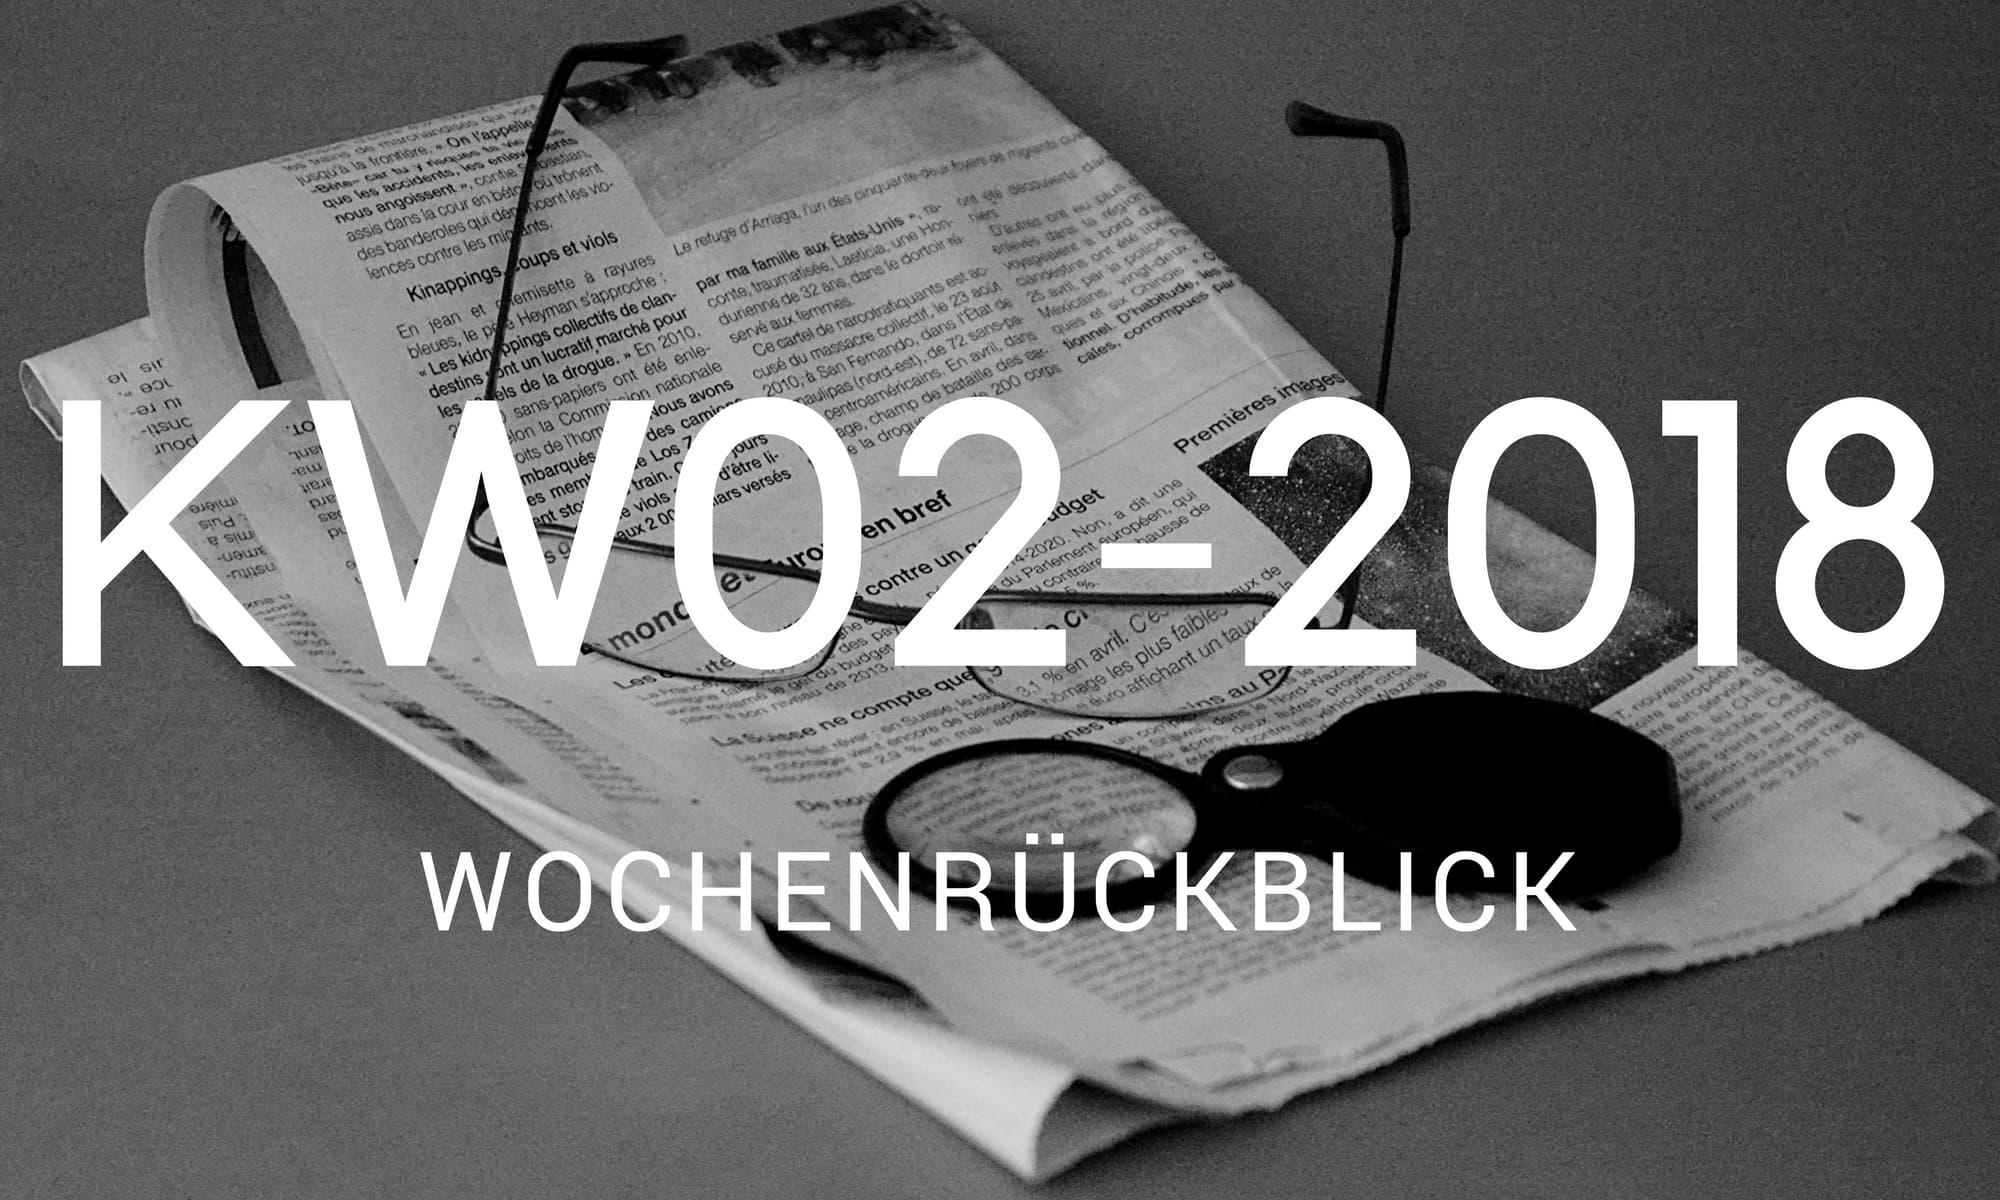 wochenrueckblick camping news KW02-2018